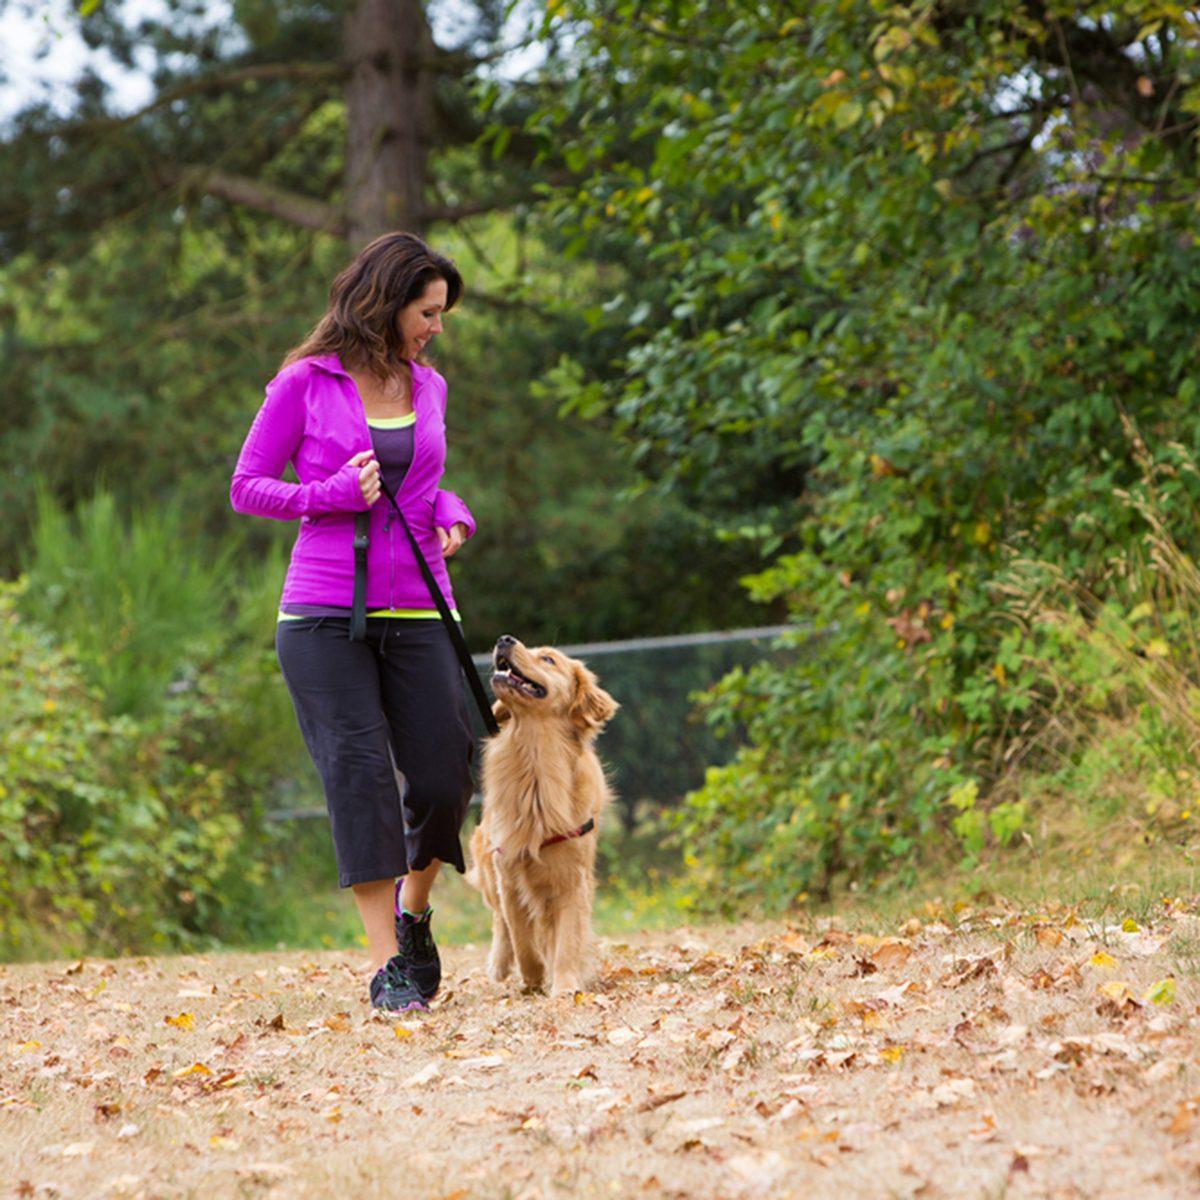 A pretty woman walking her dog